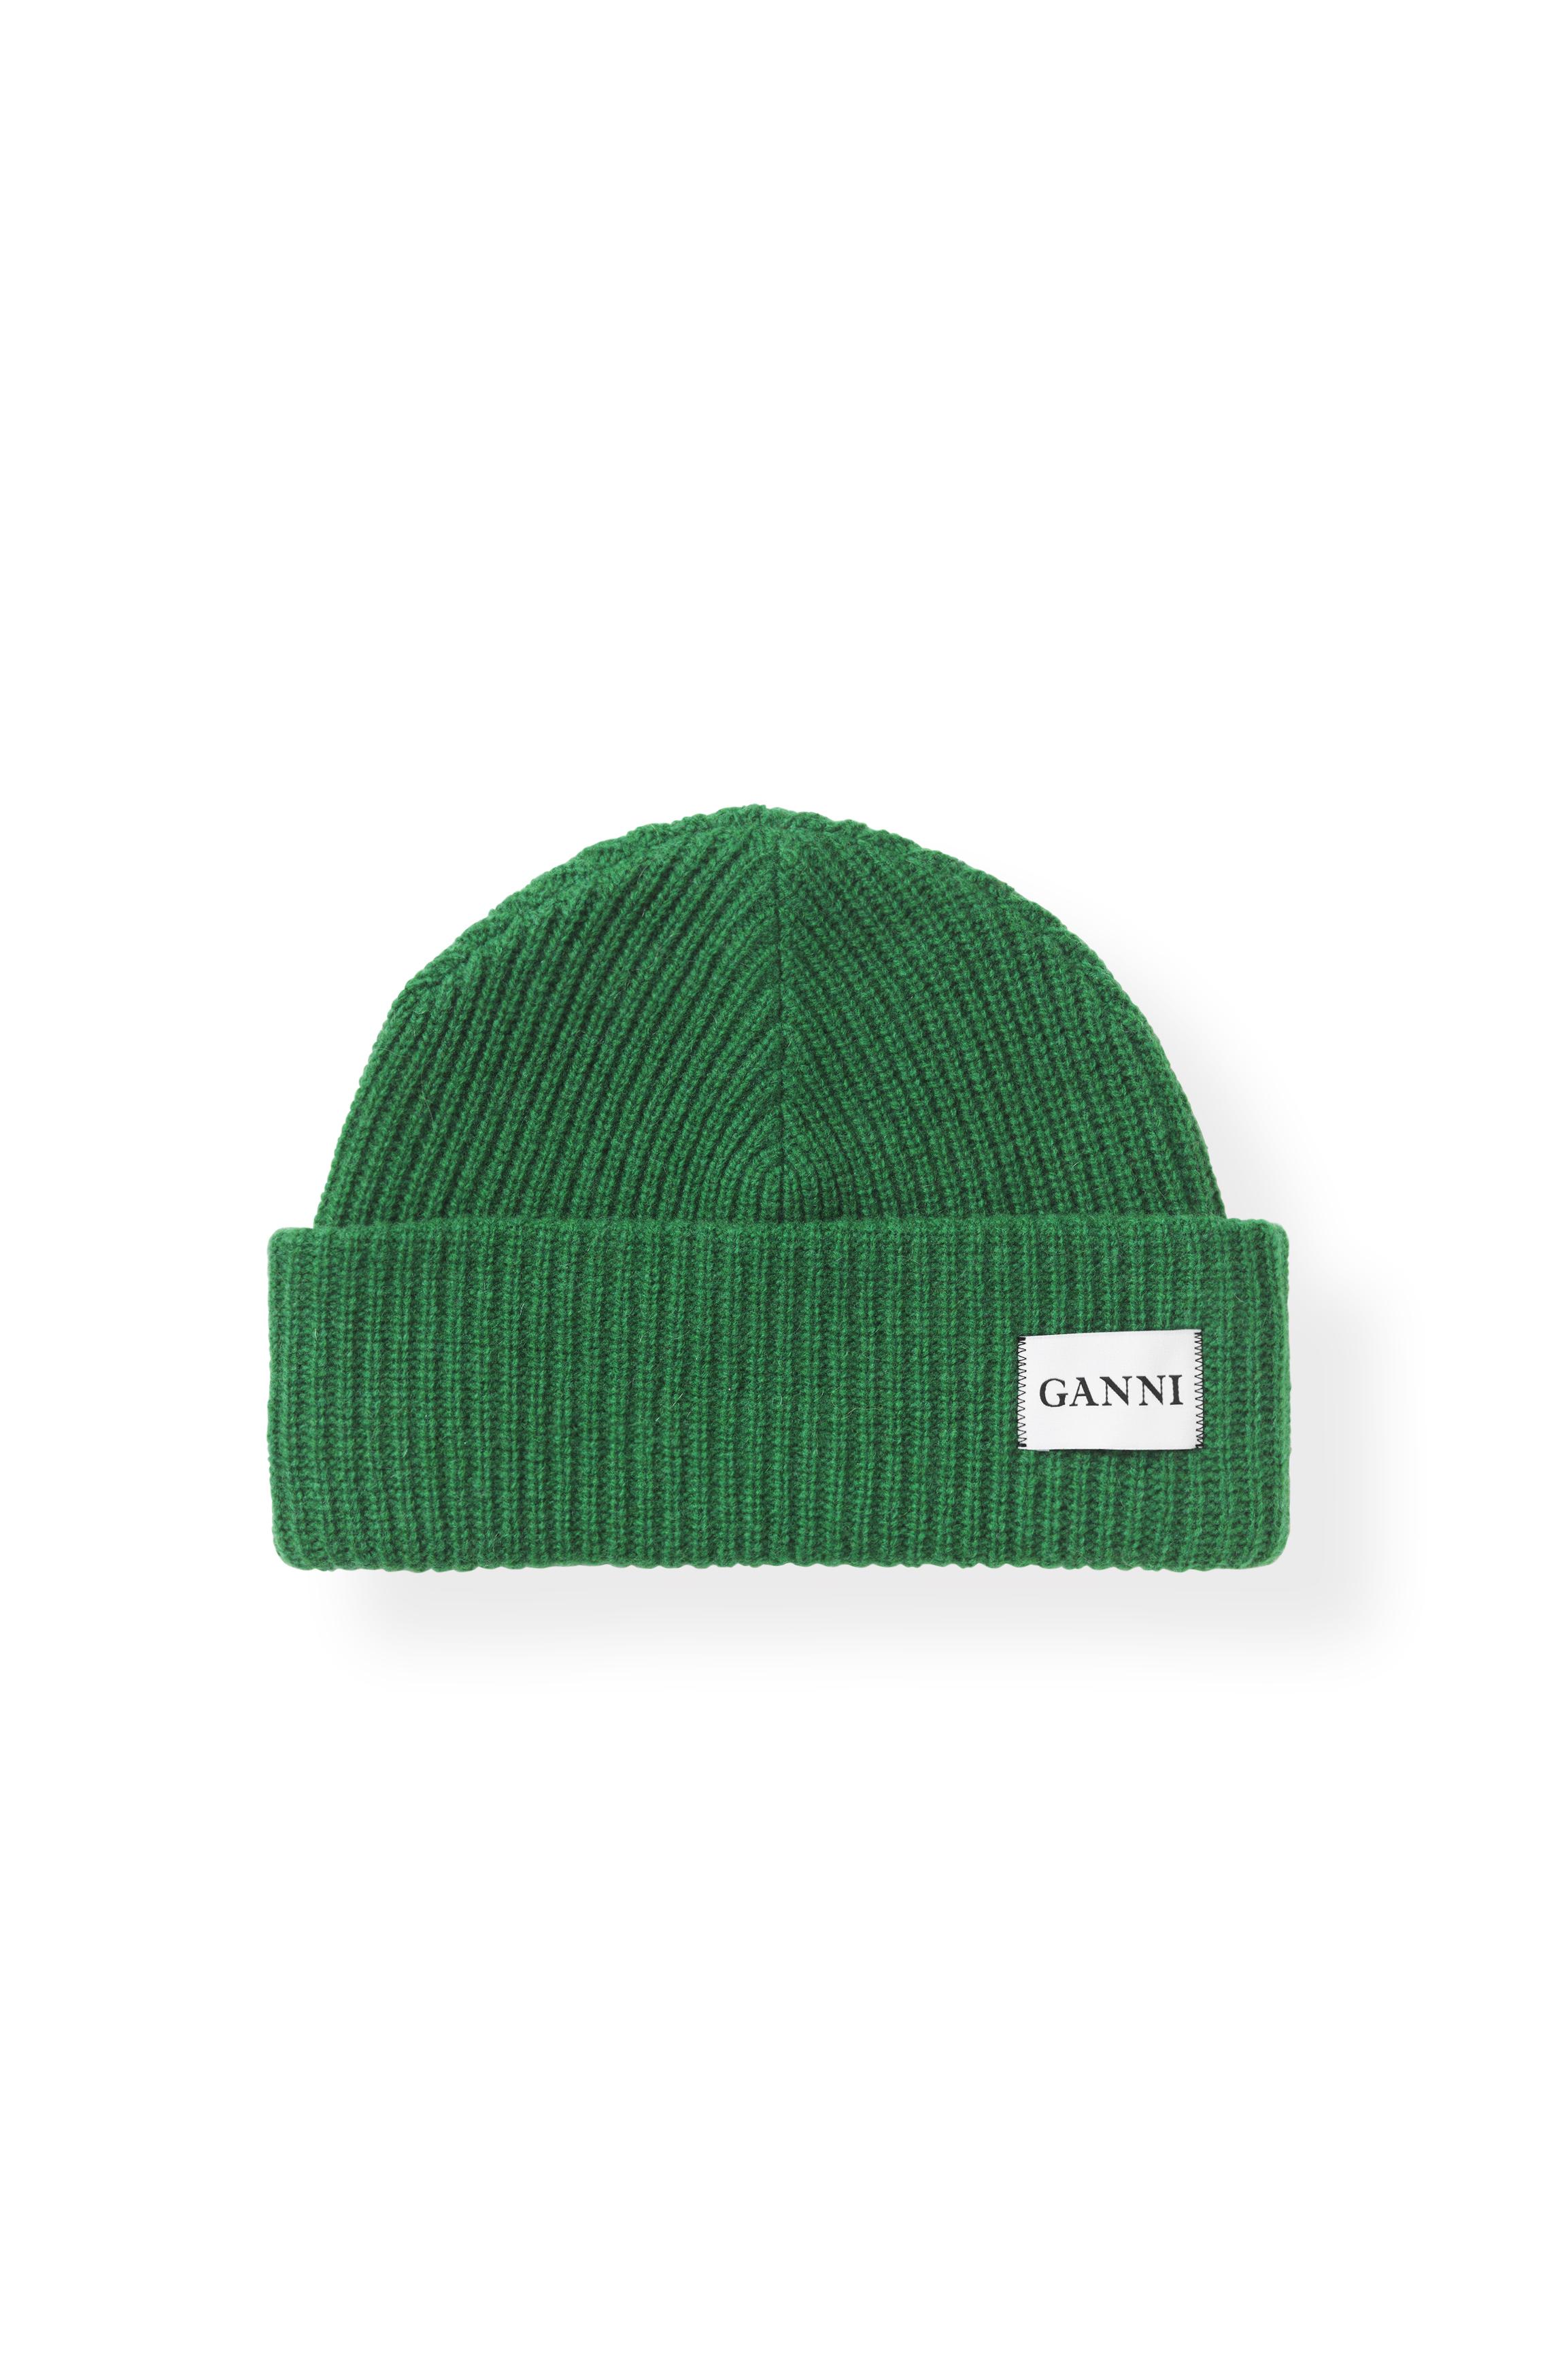 Image of   Ganni A1630 Hat Knit, 807 Juniper